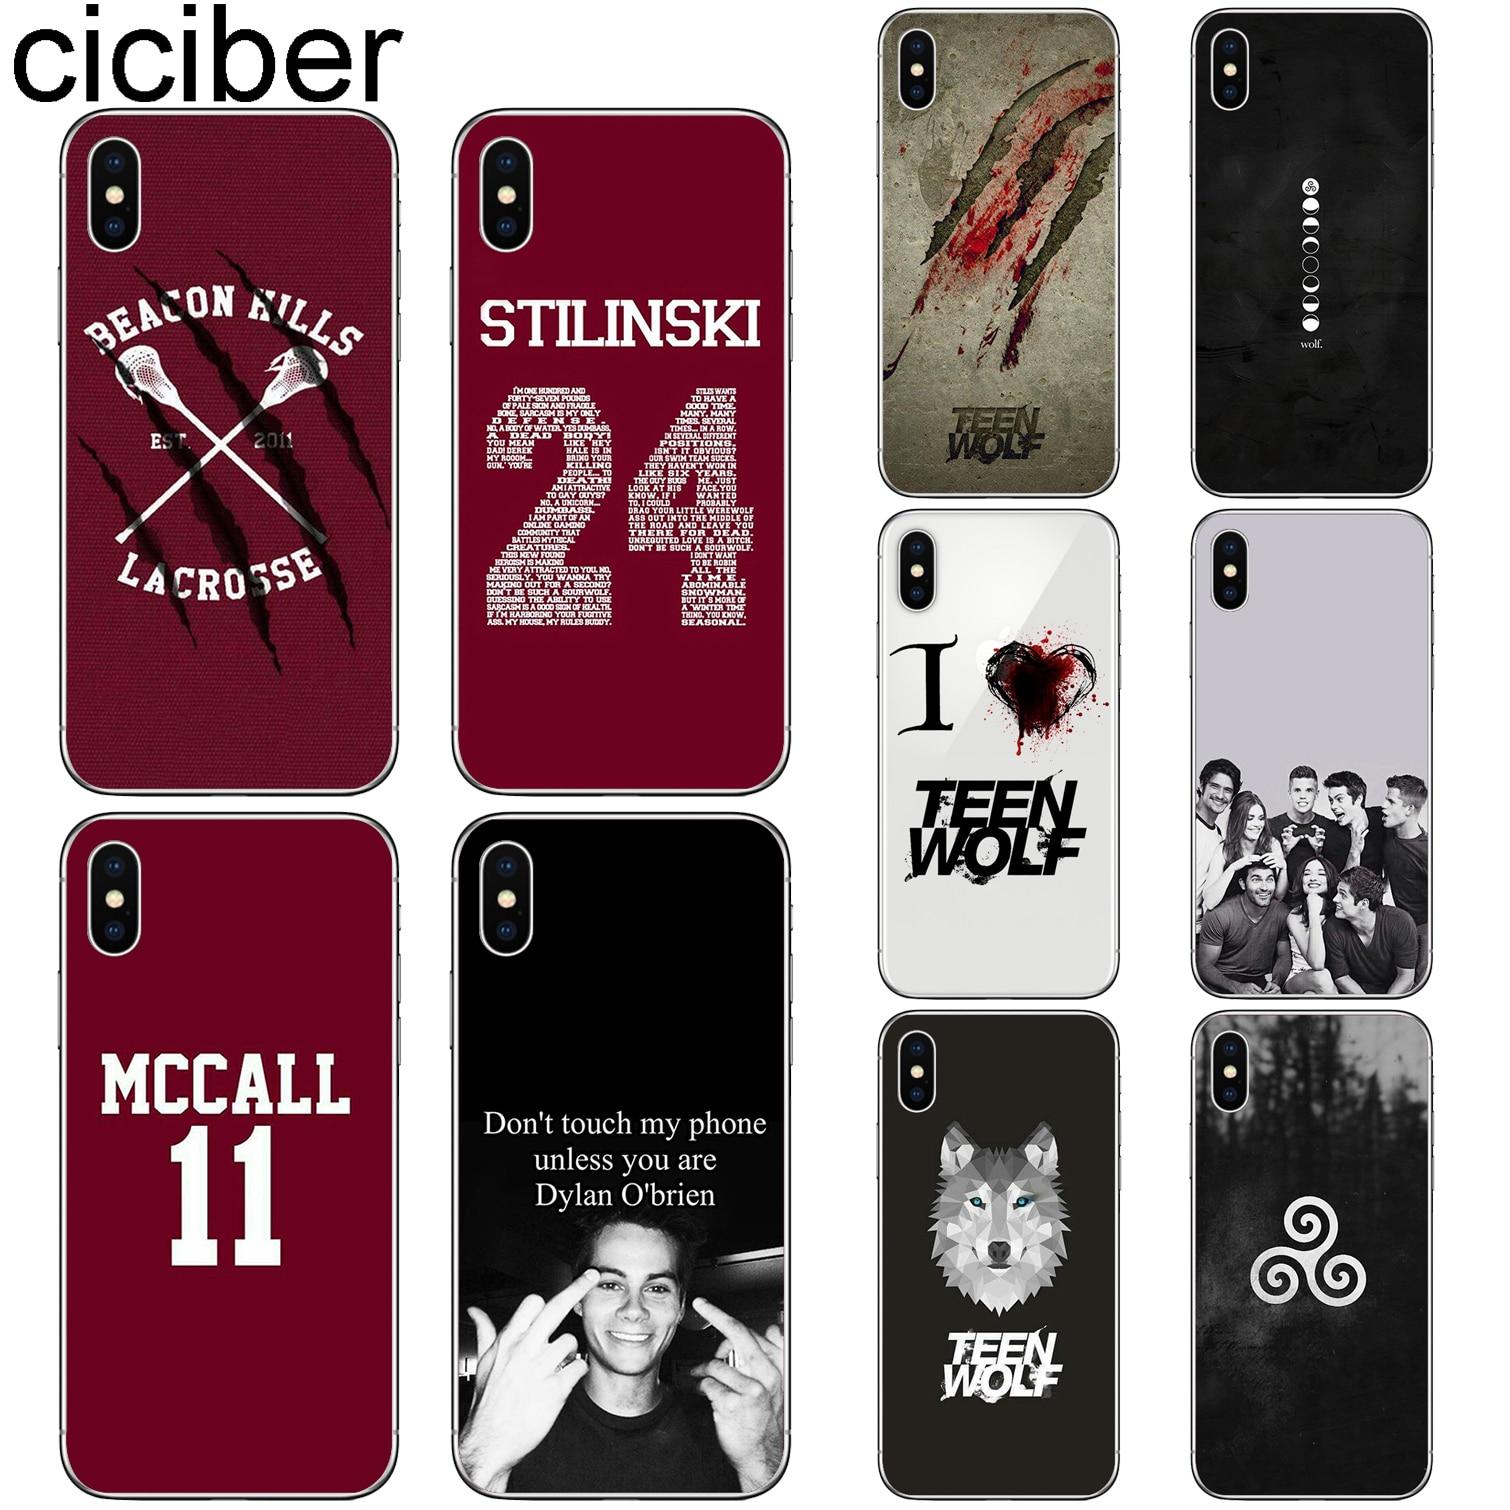 Cuciber teen wolf capa funda para iphone 7 8 6 s plus 5S se 11 pro max macio tpu caso de telefone para iphone x xs max xr coque capa